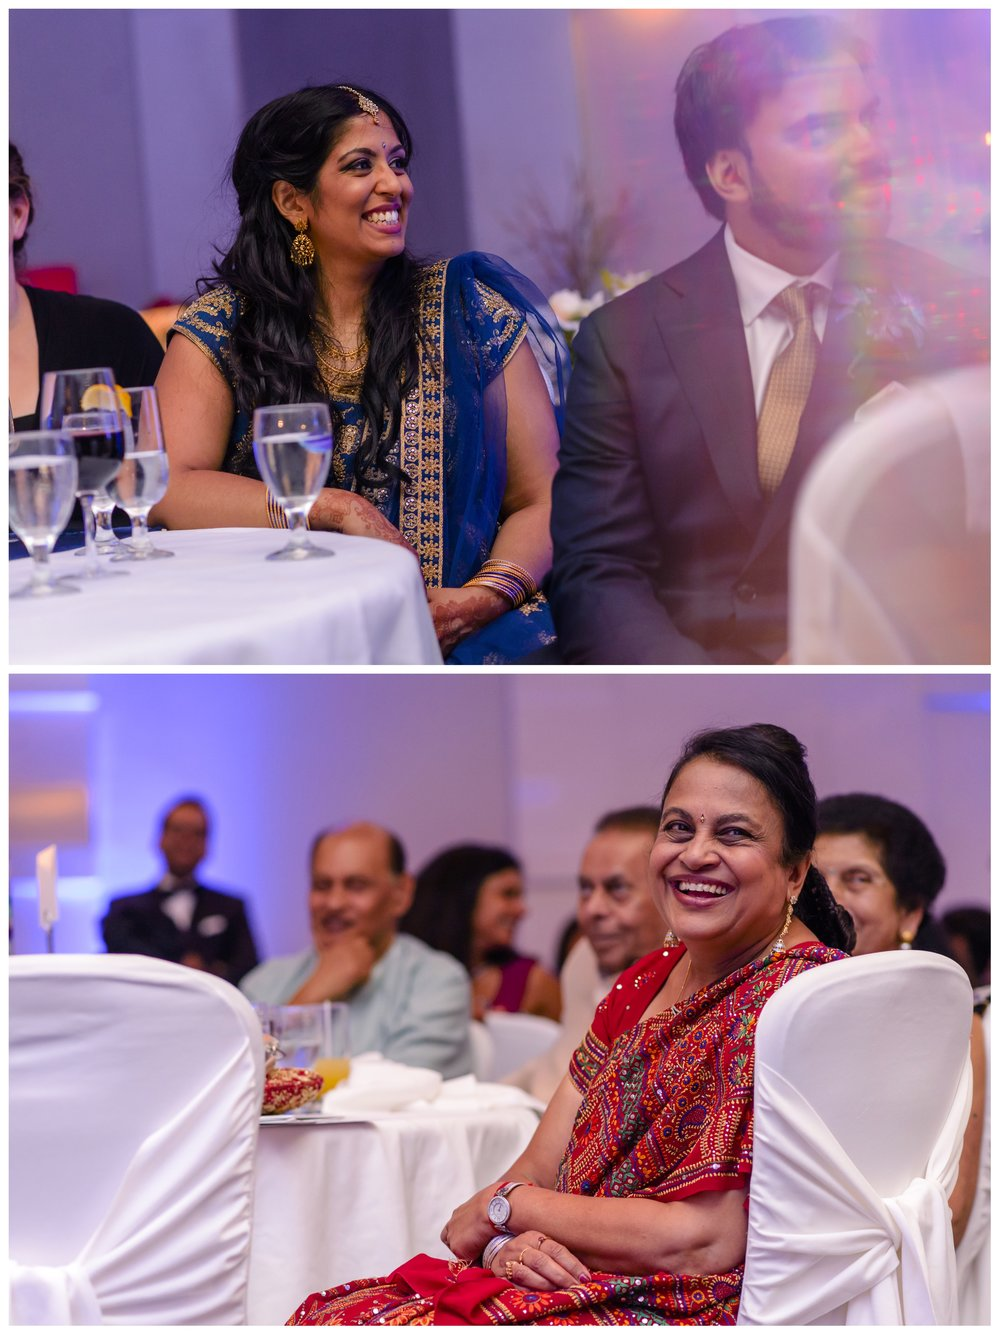 Indian wedding reception photographs